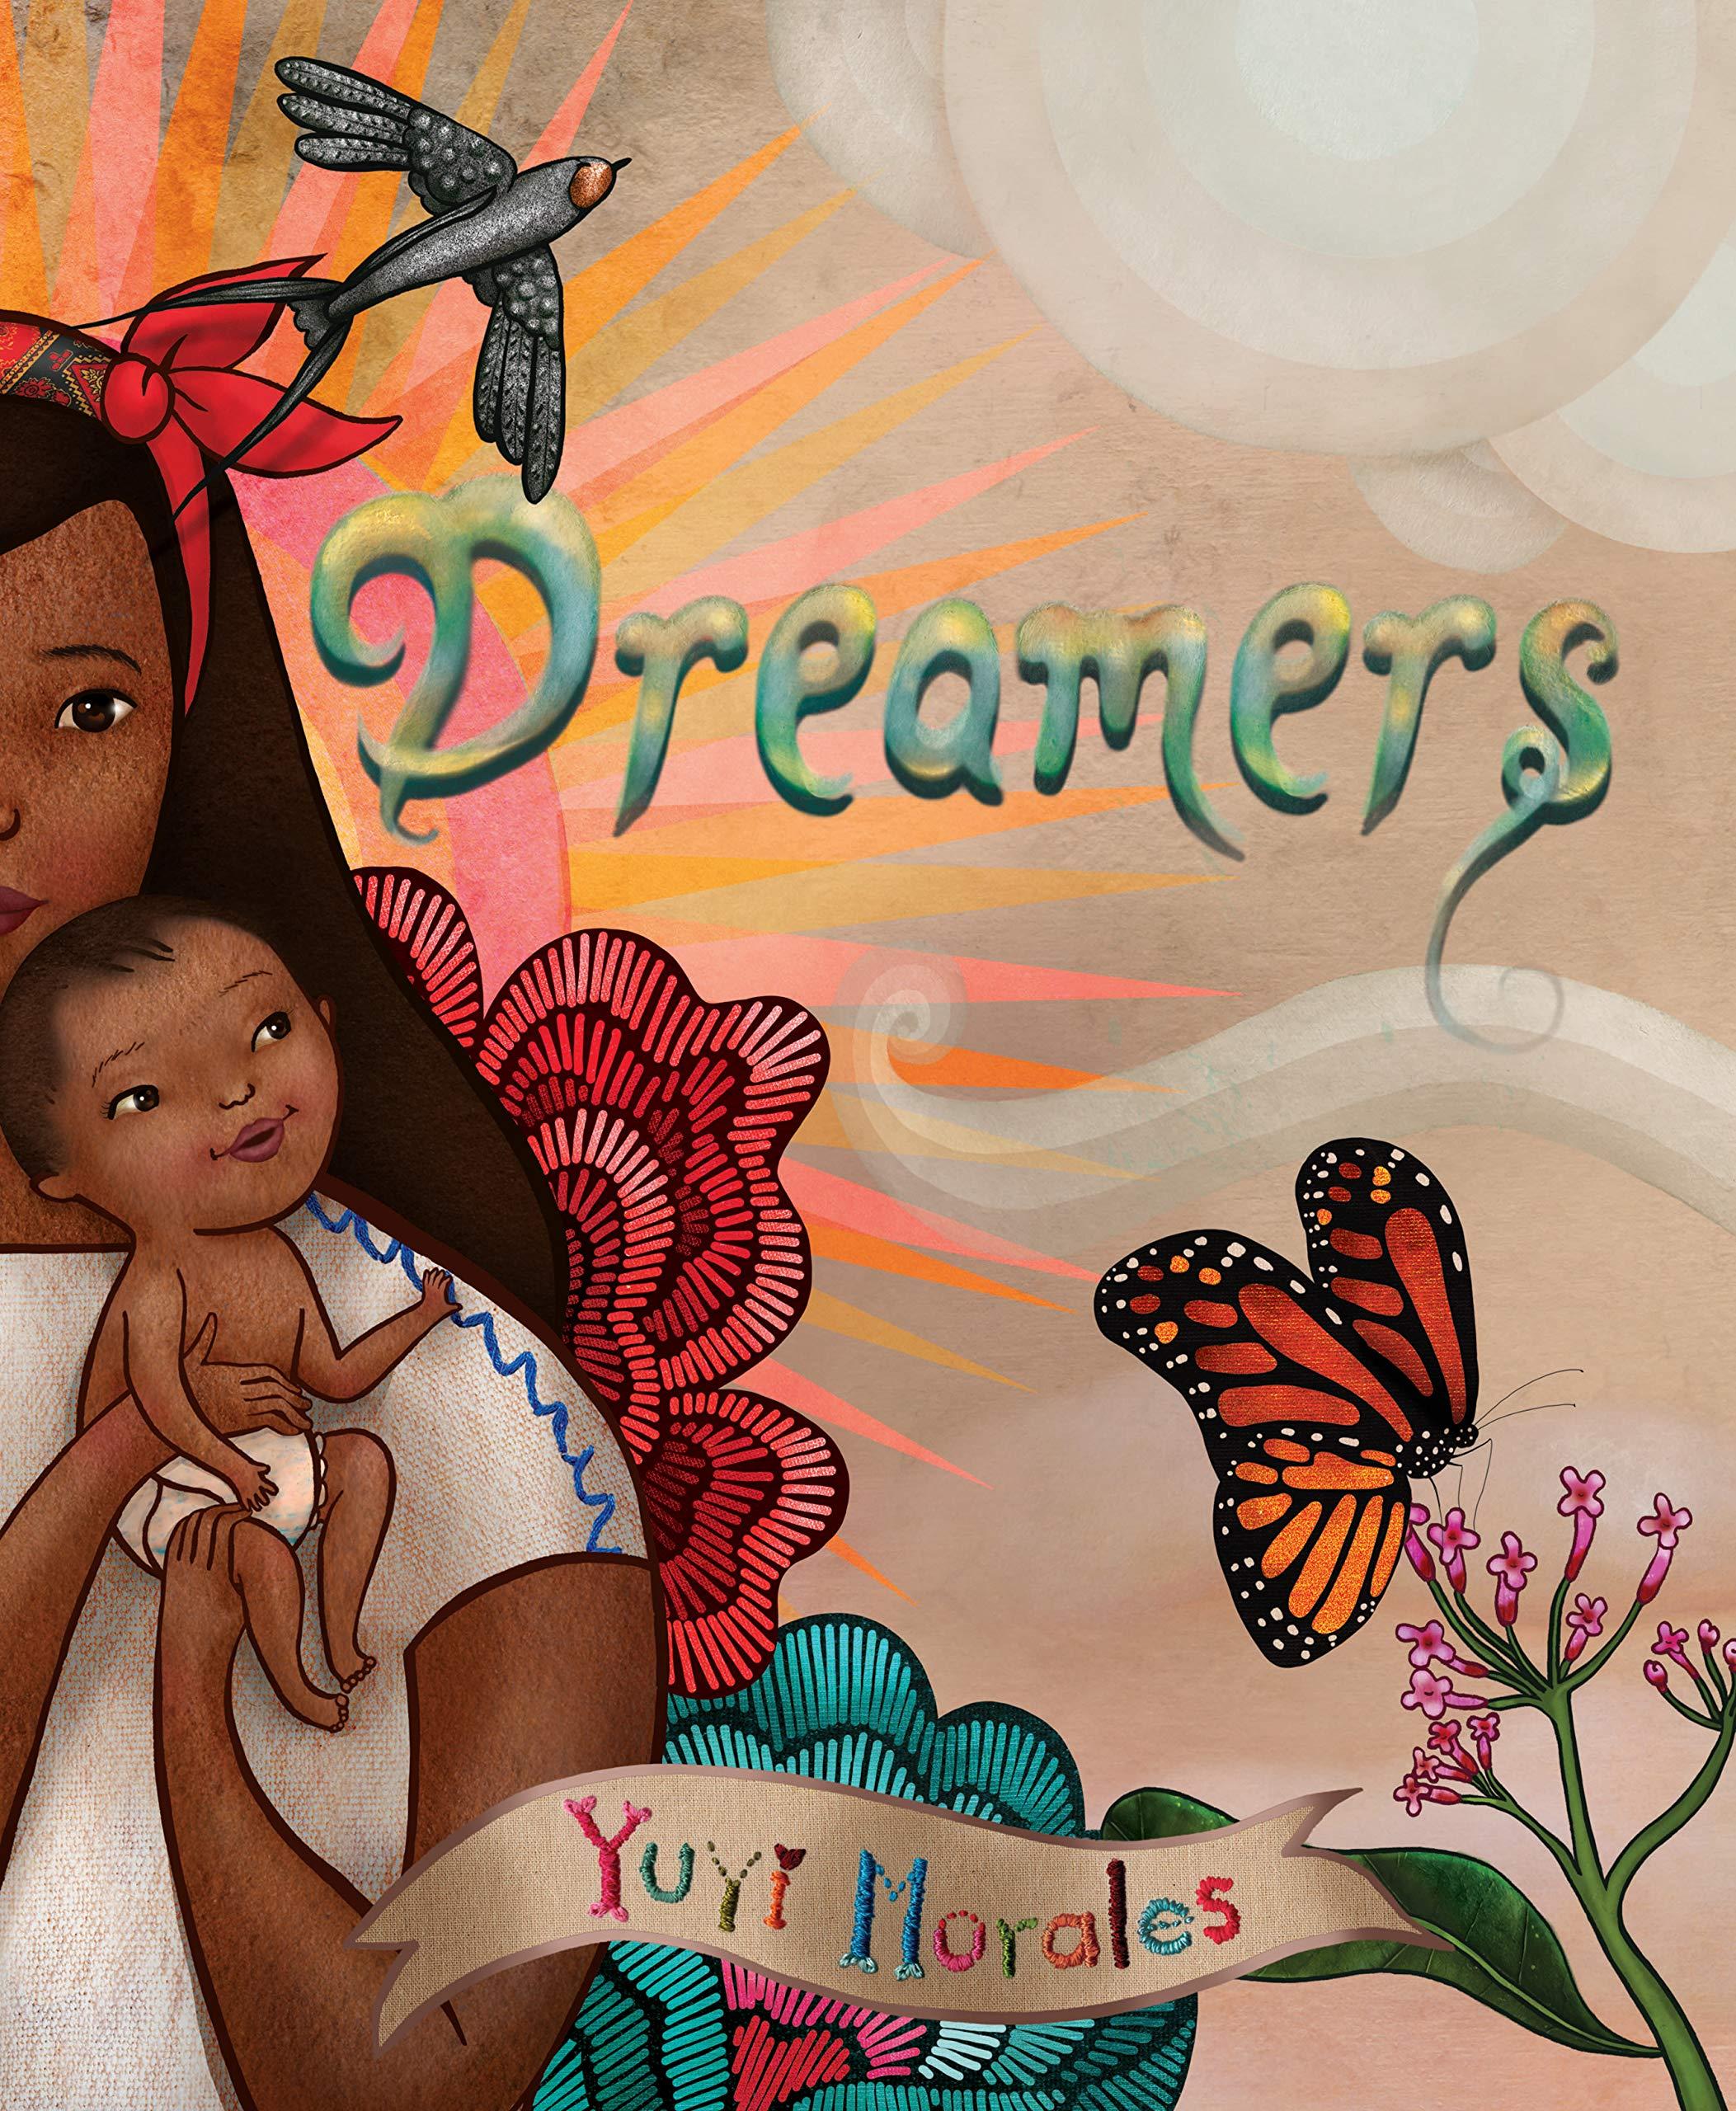 Dreamers Yuyi Morales.jpg